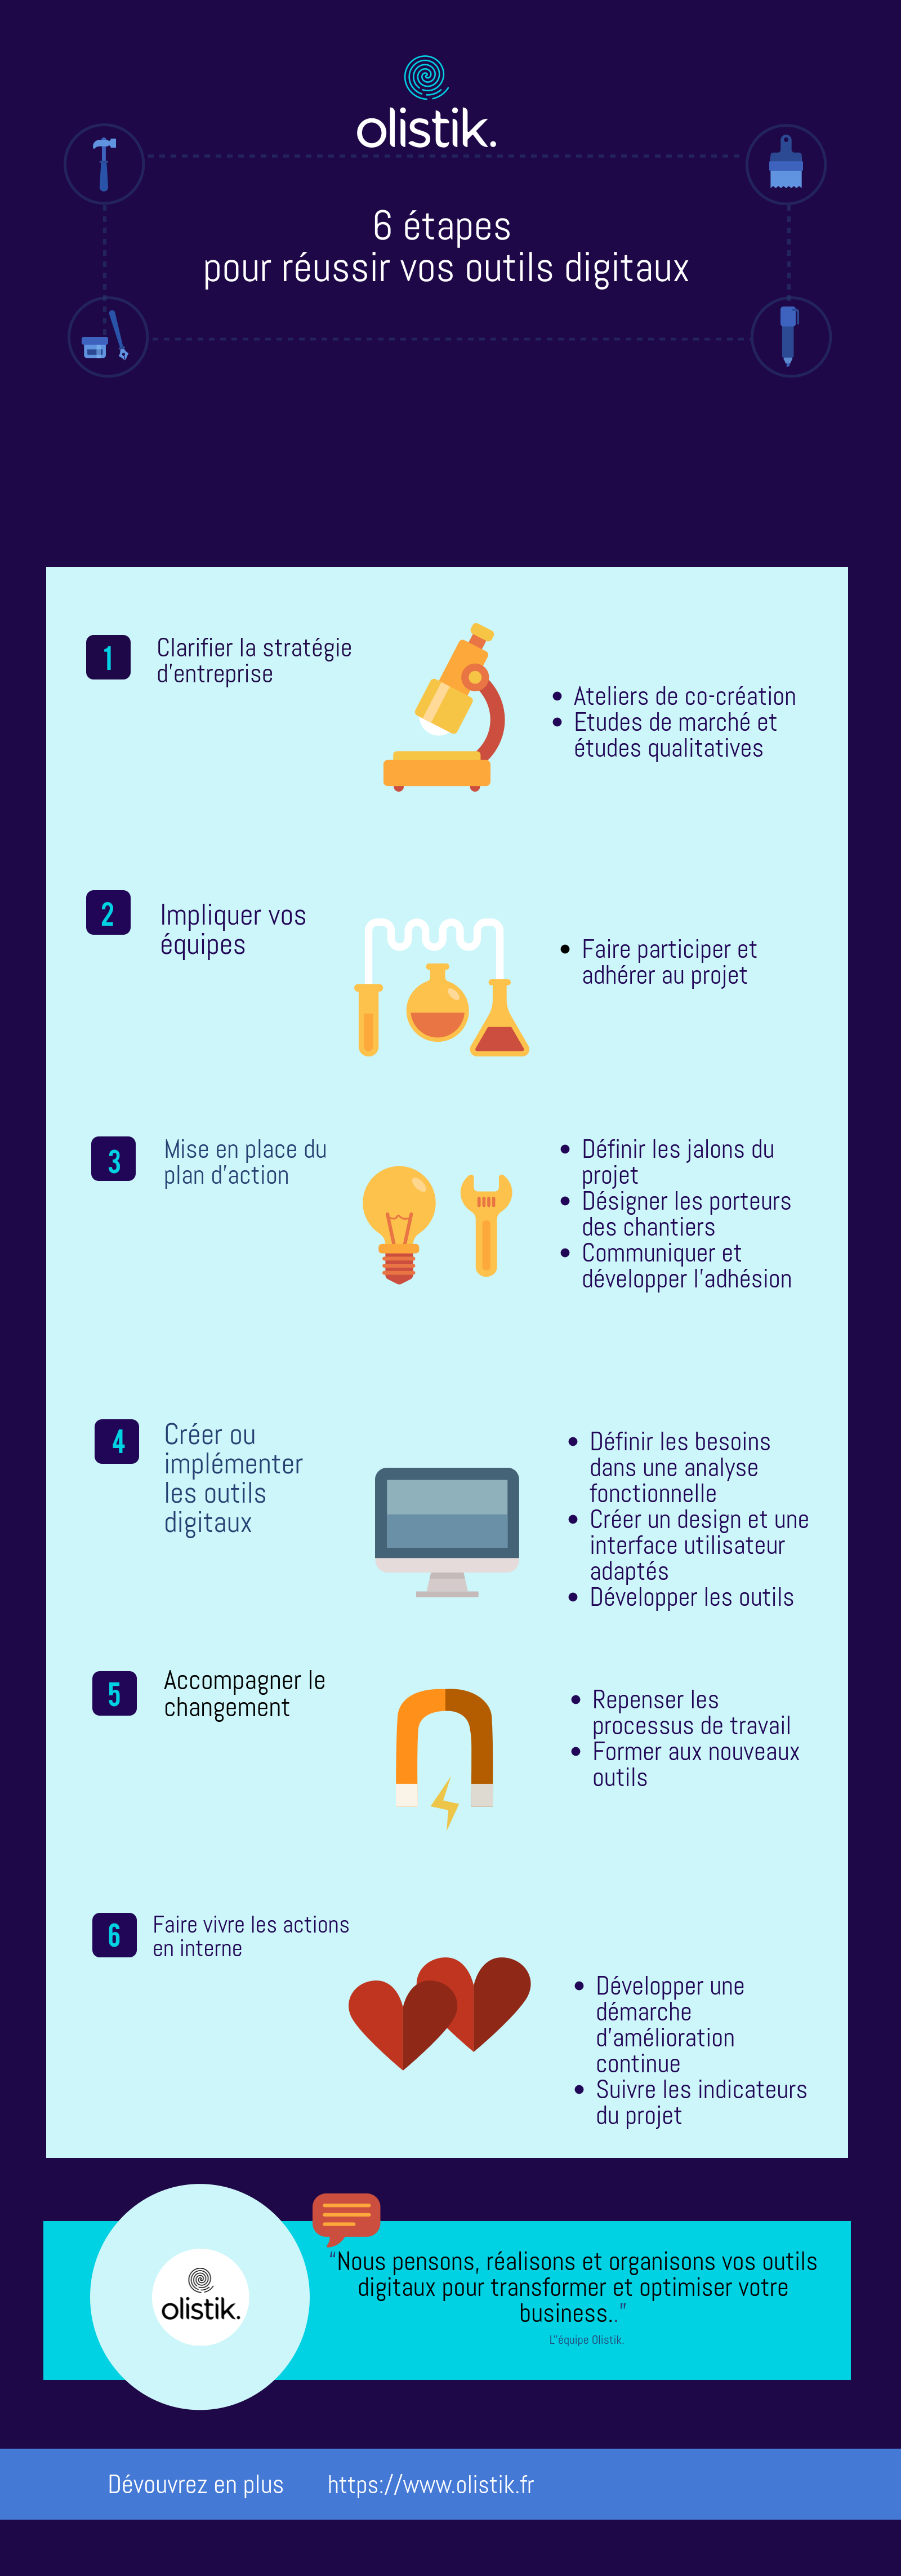 Olistik - Infographie